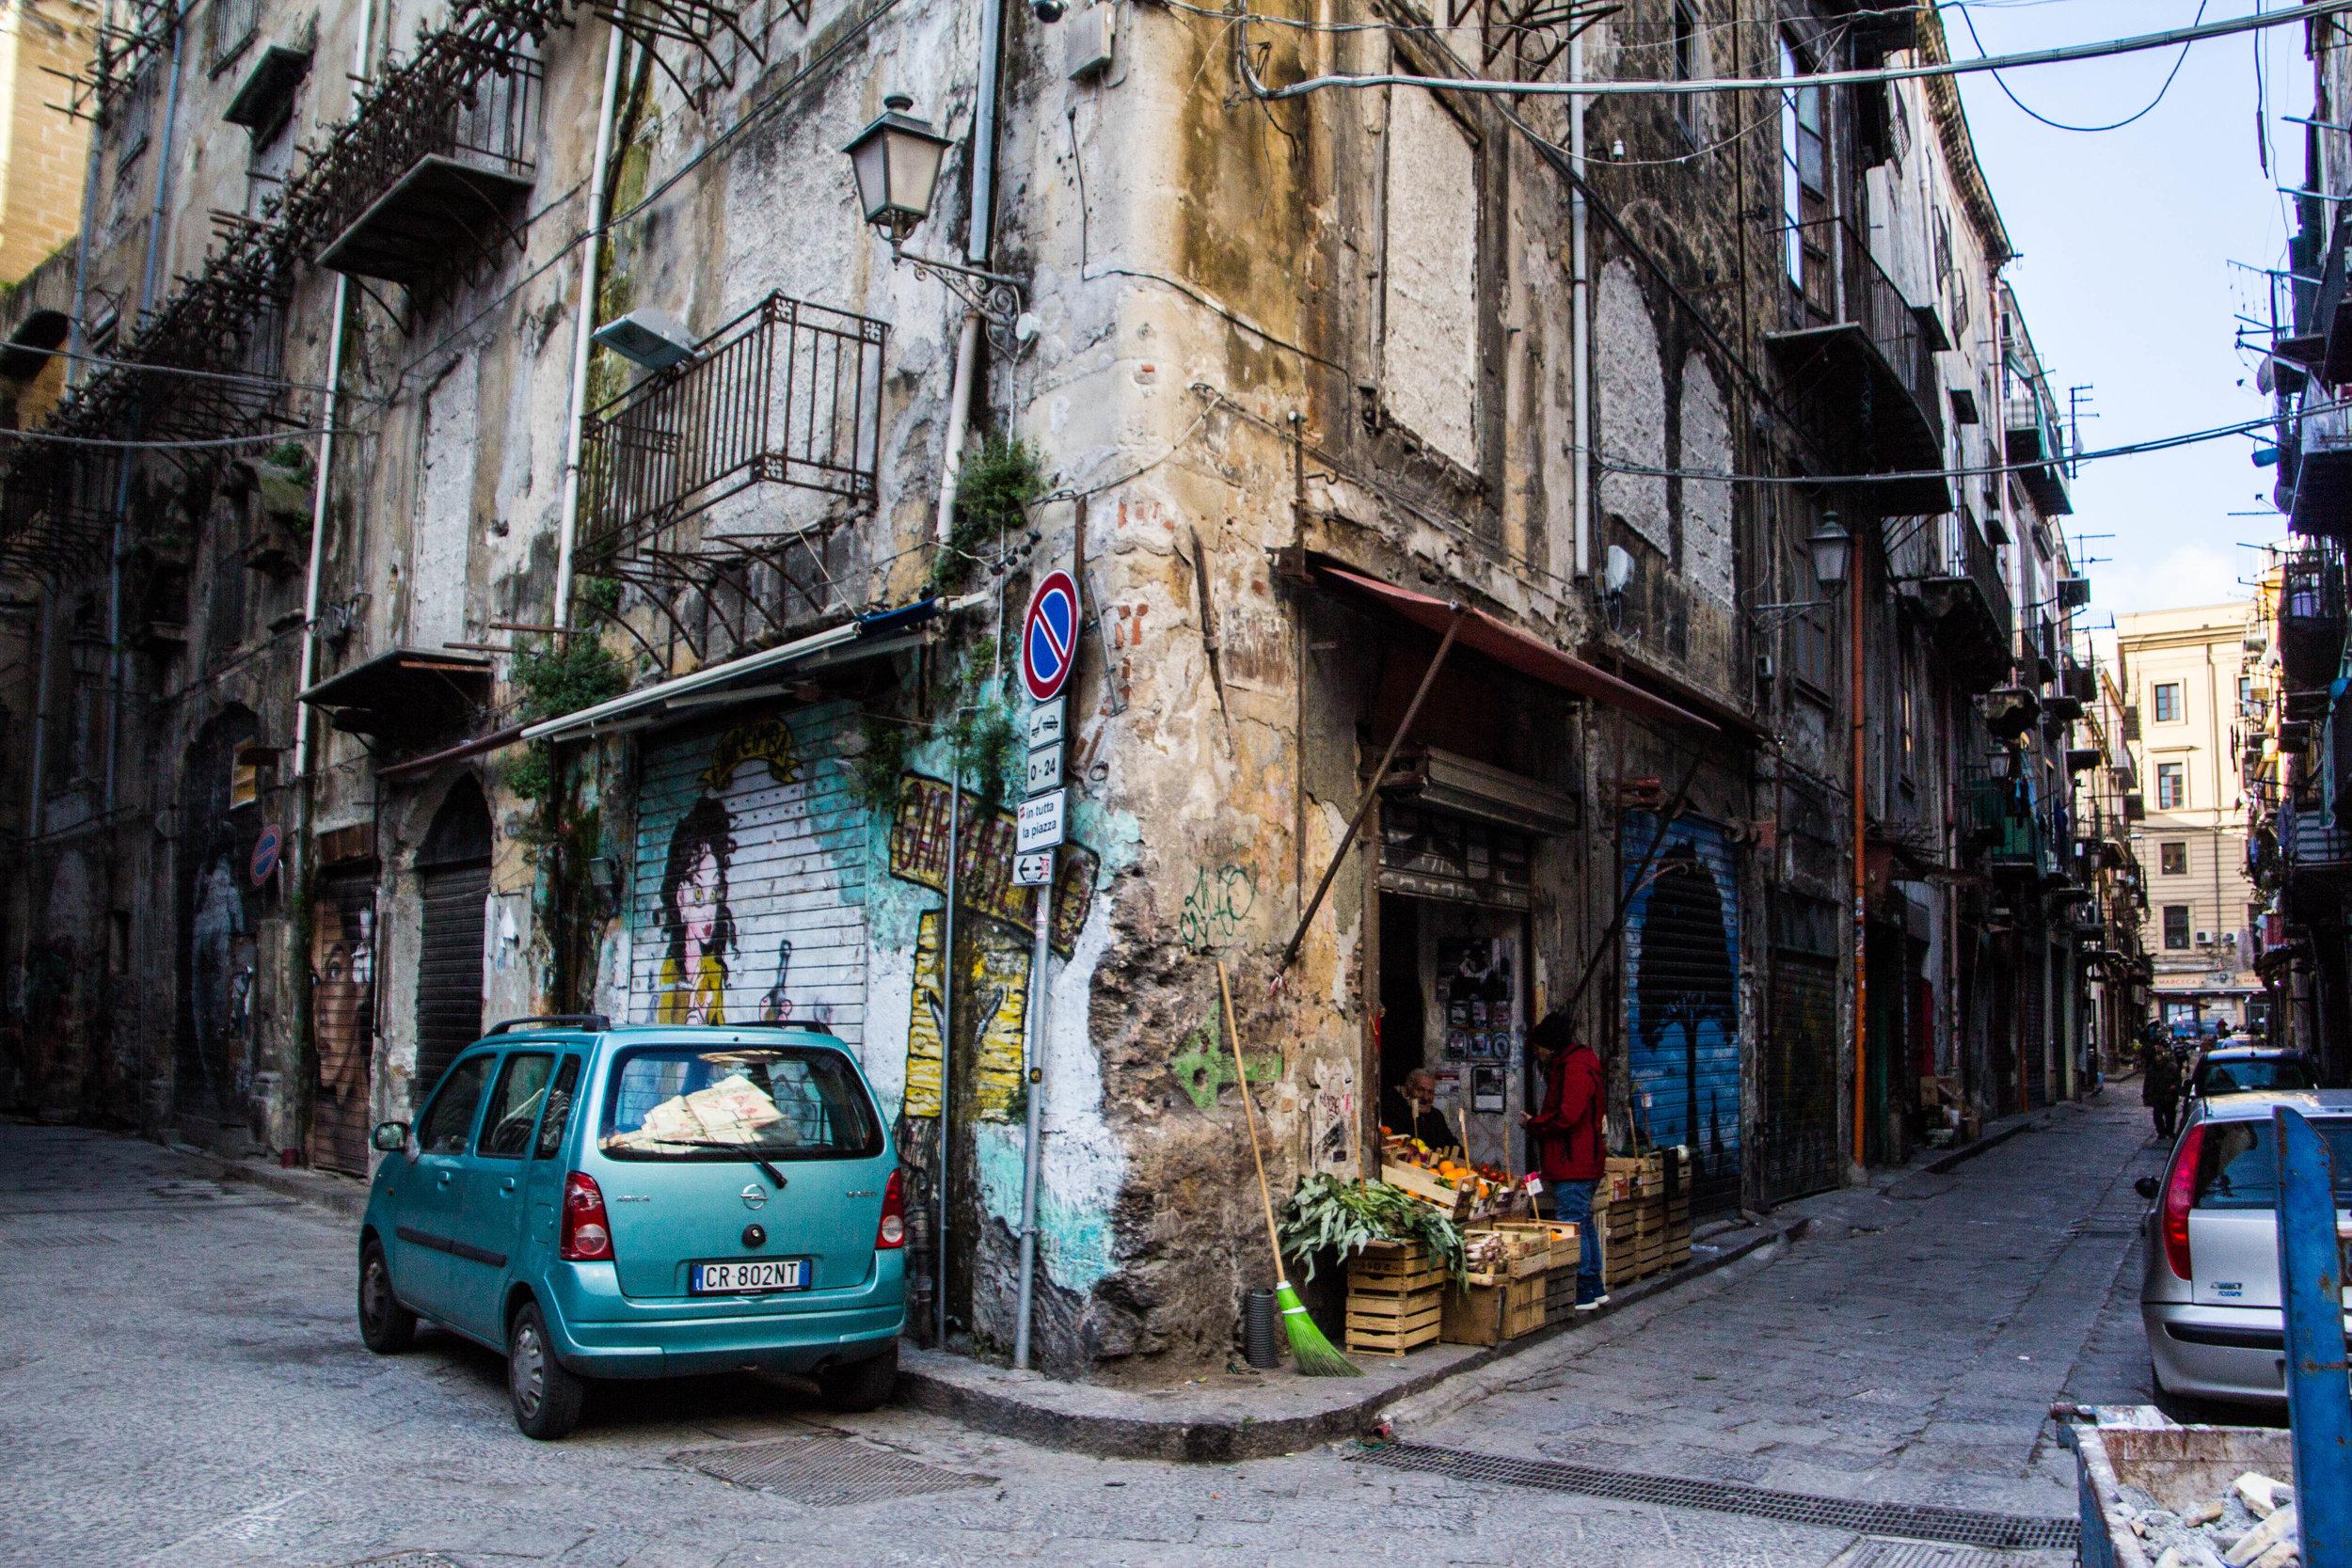 street-photography-palermo-sicily-39.jpg